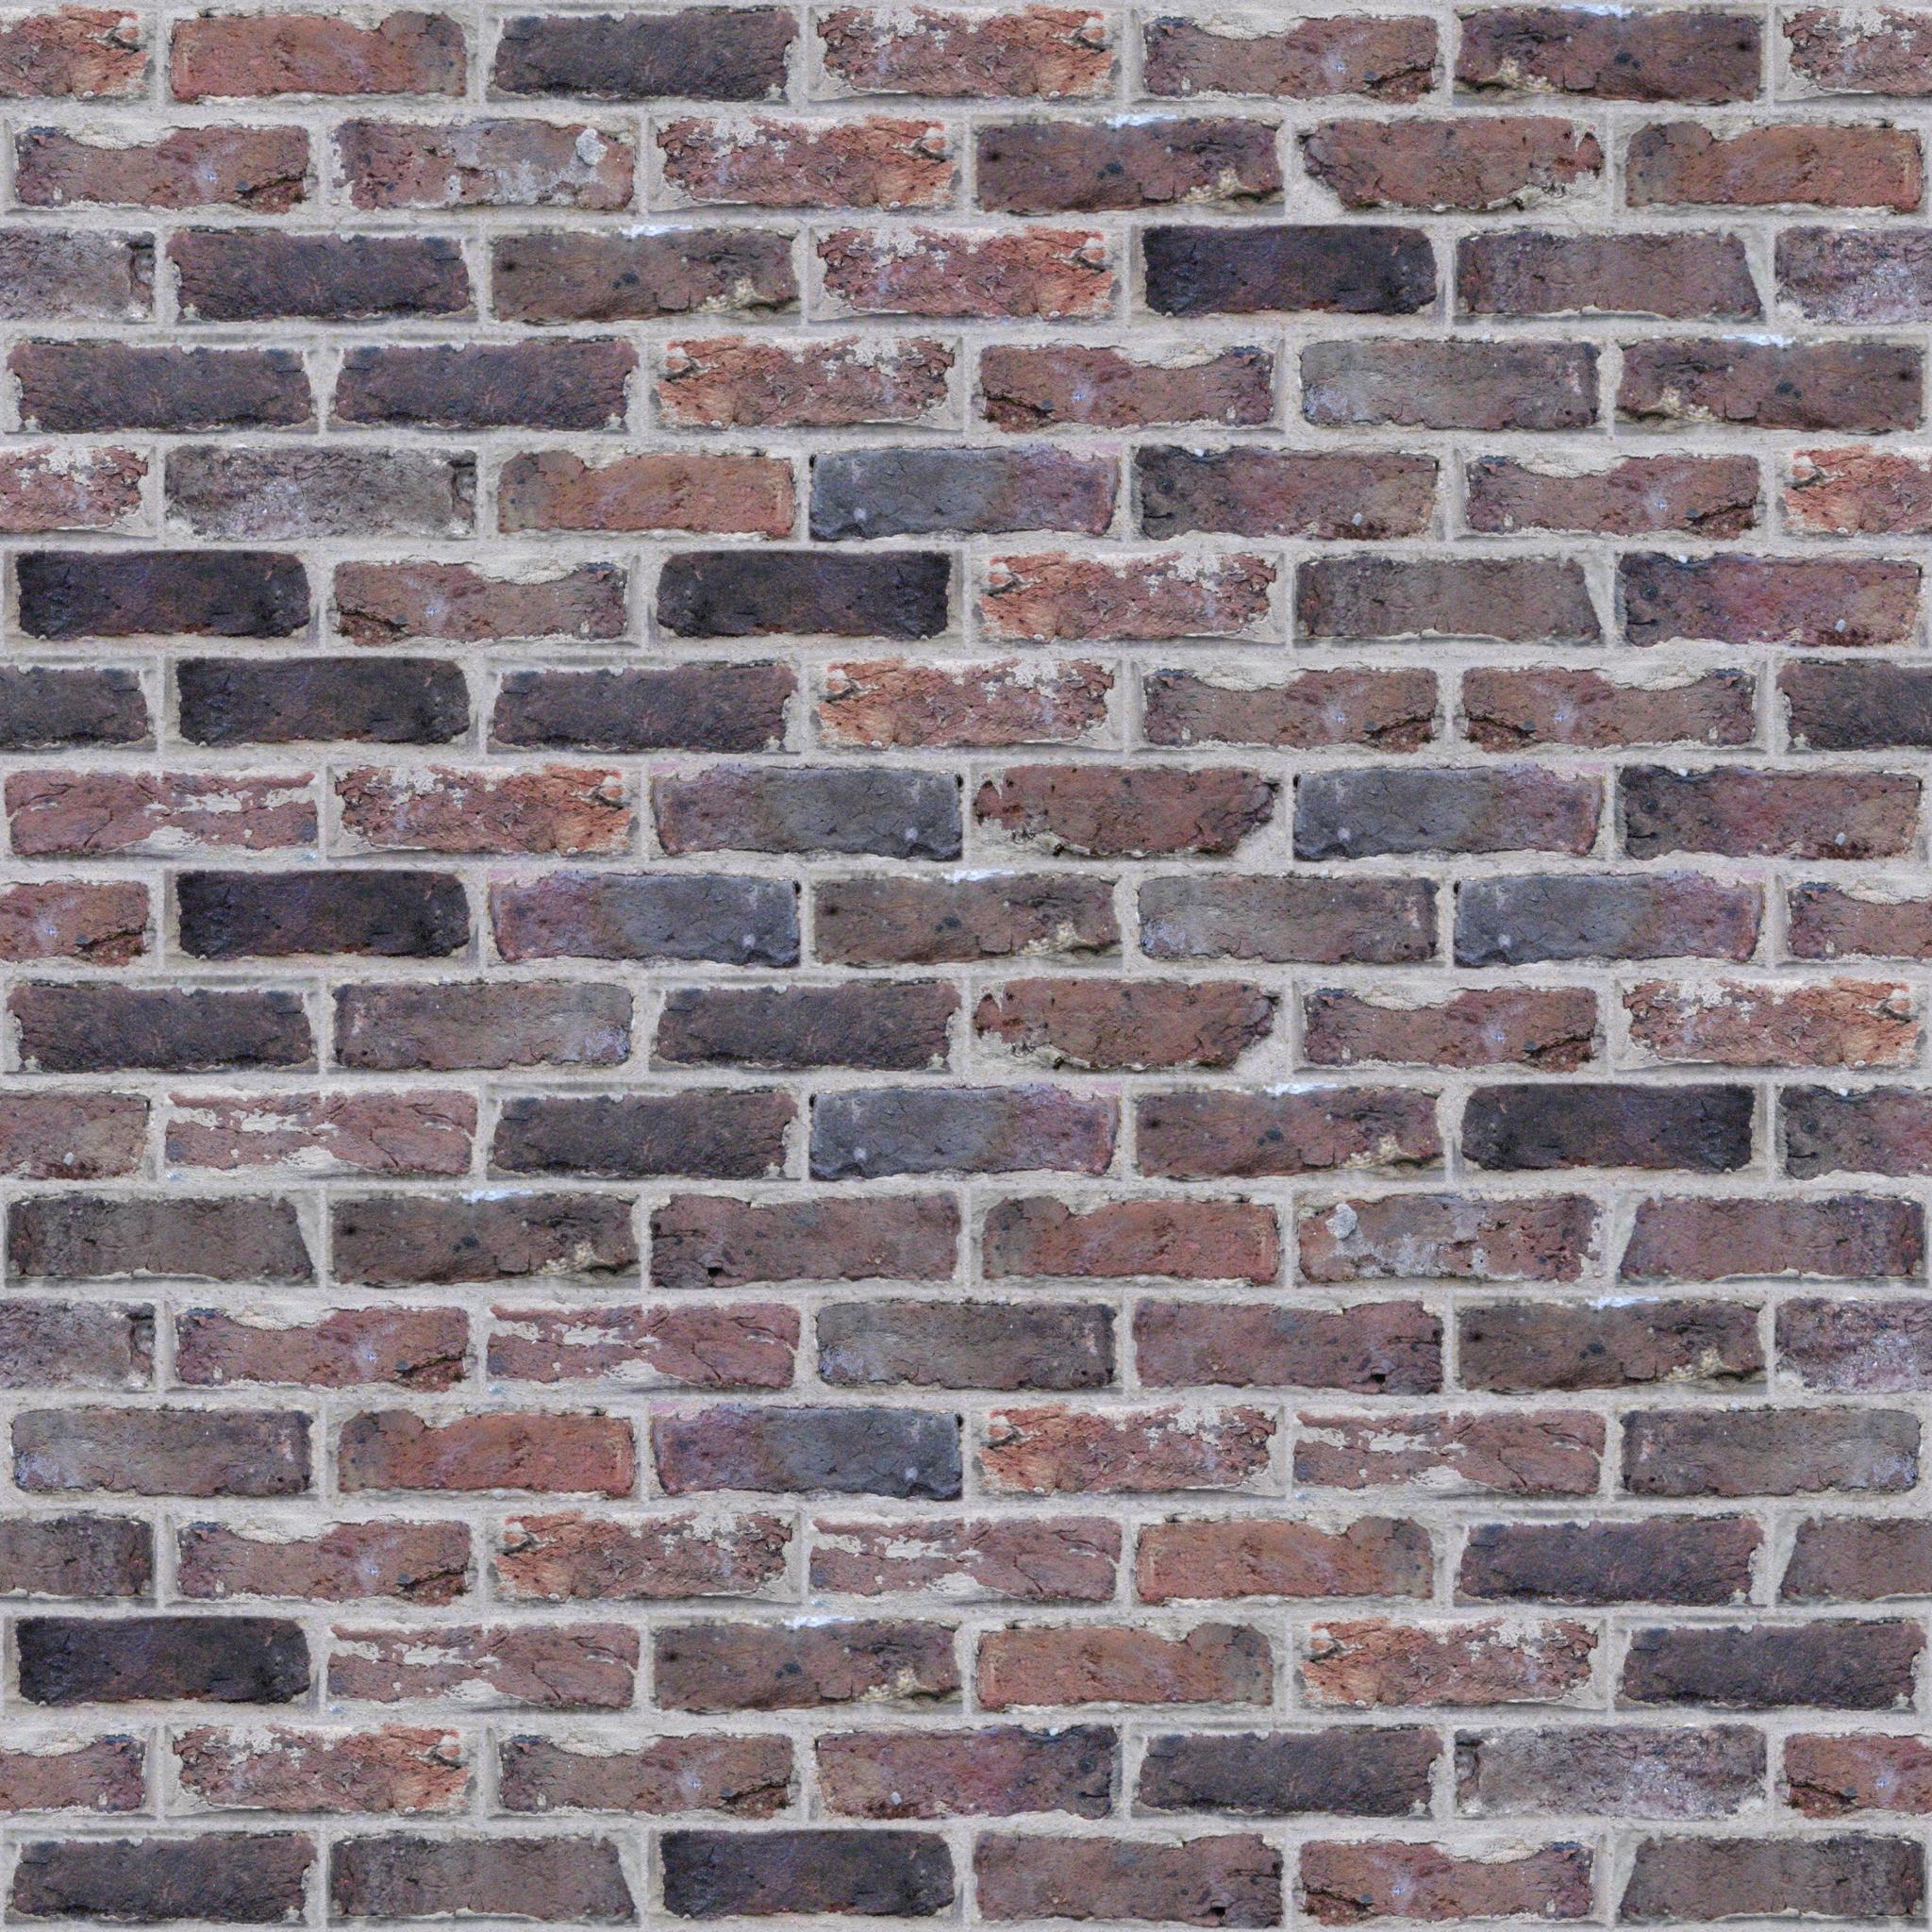 brick wall texture   Material-stone   Pinterest   Wall textures ...